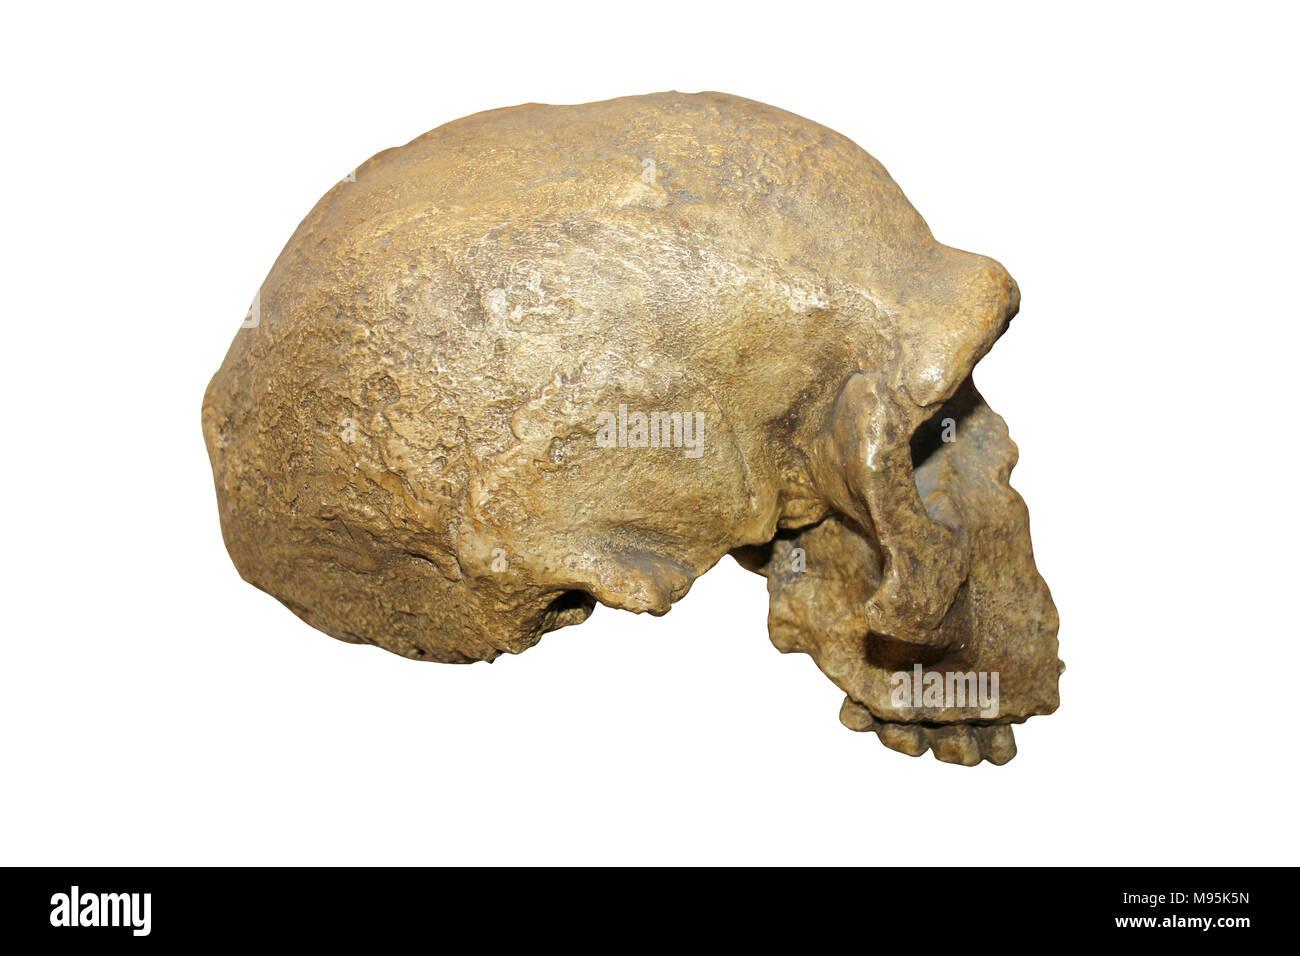 Steinheim Man skull - Stock Image